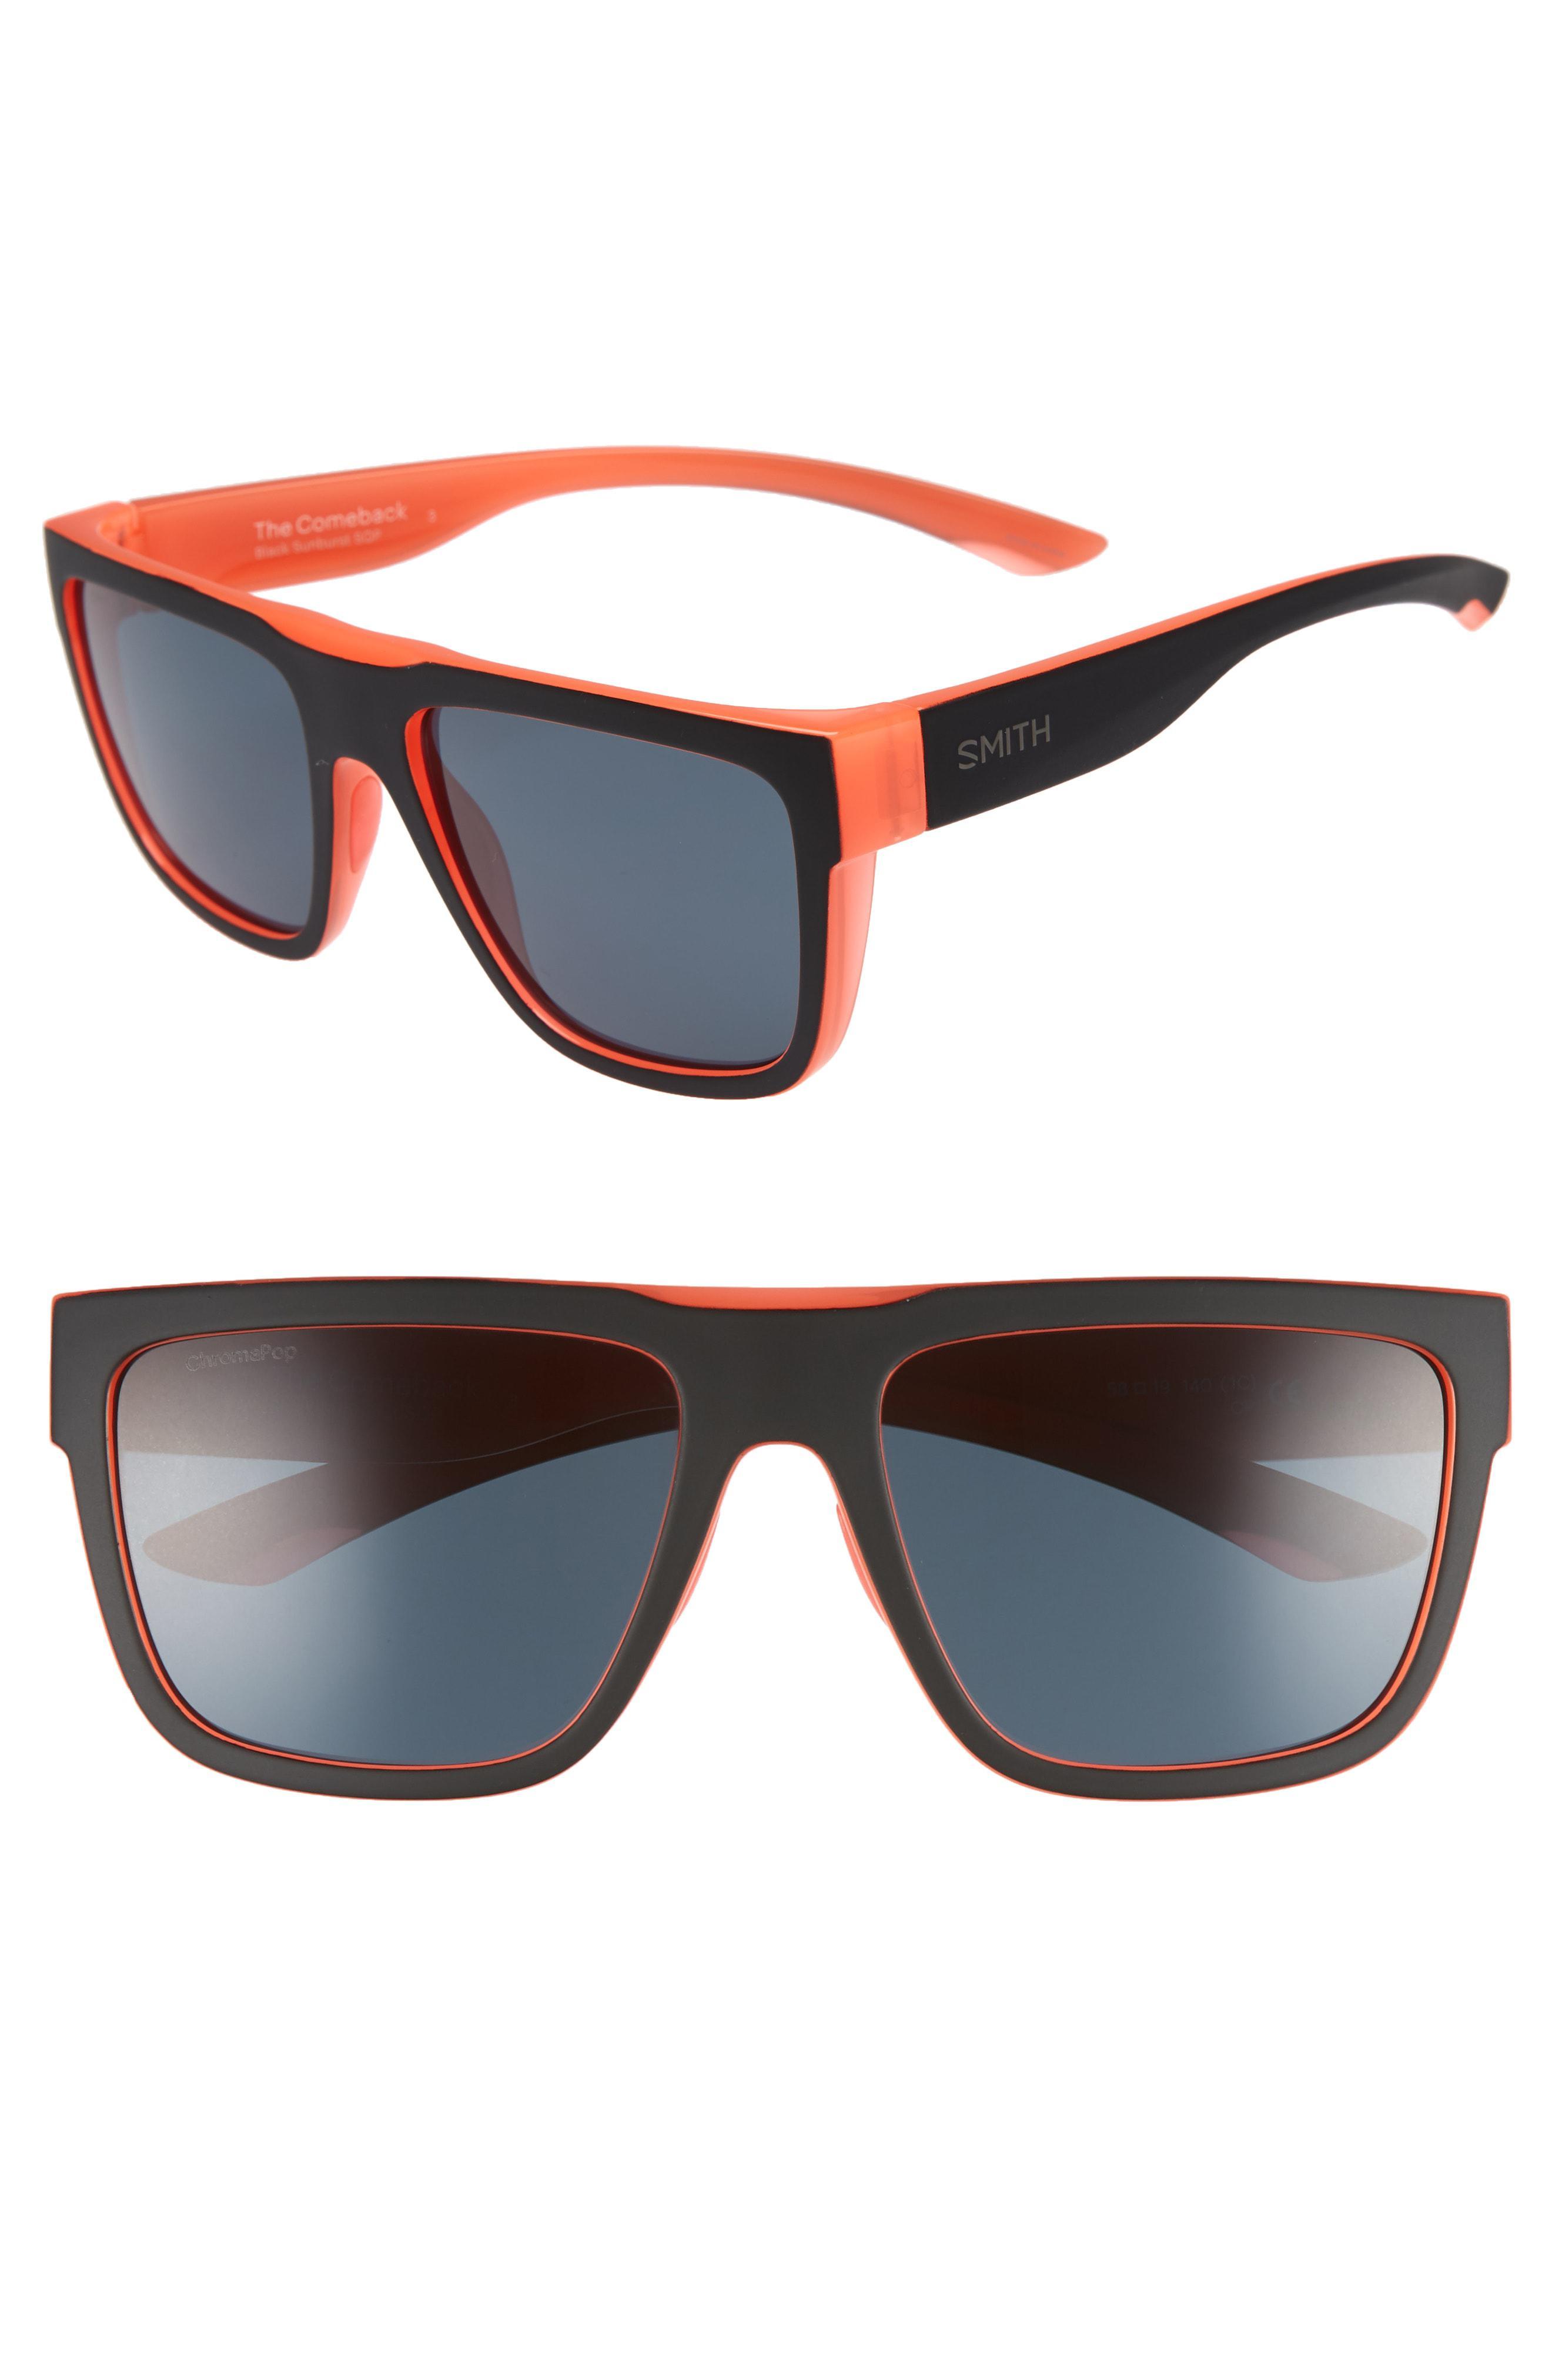 881d5c22dd Lyst - Smith The Comeback 58mm Chromapop(tm) Square Sunglasses in Black